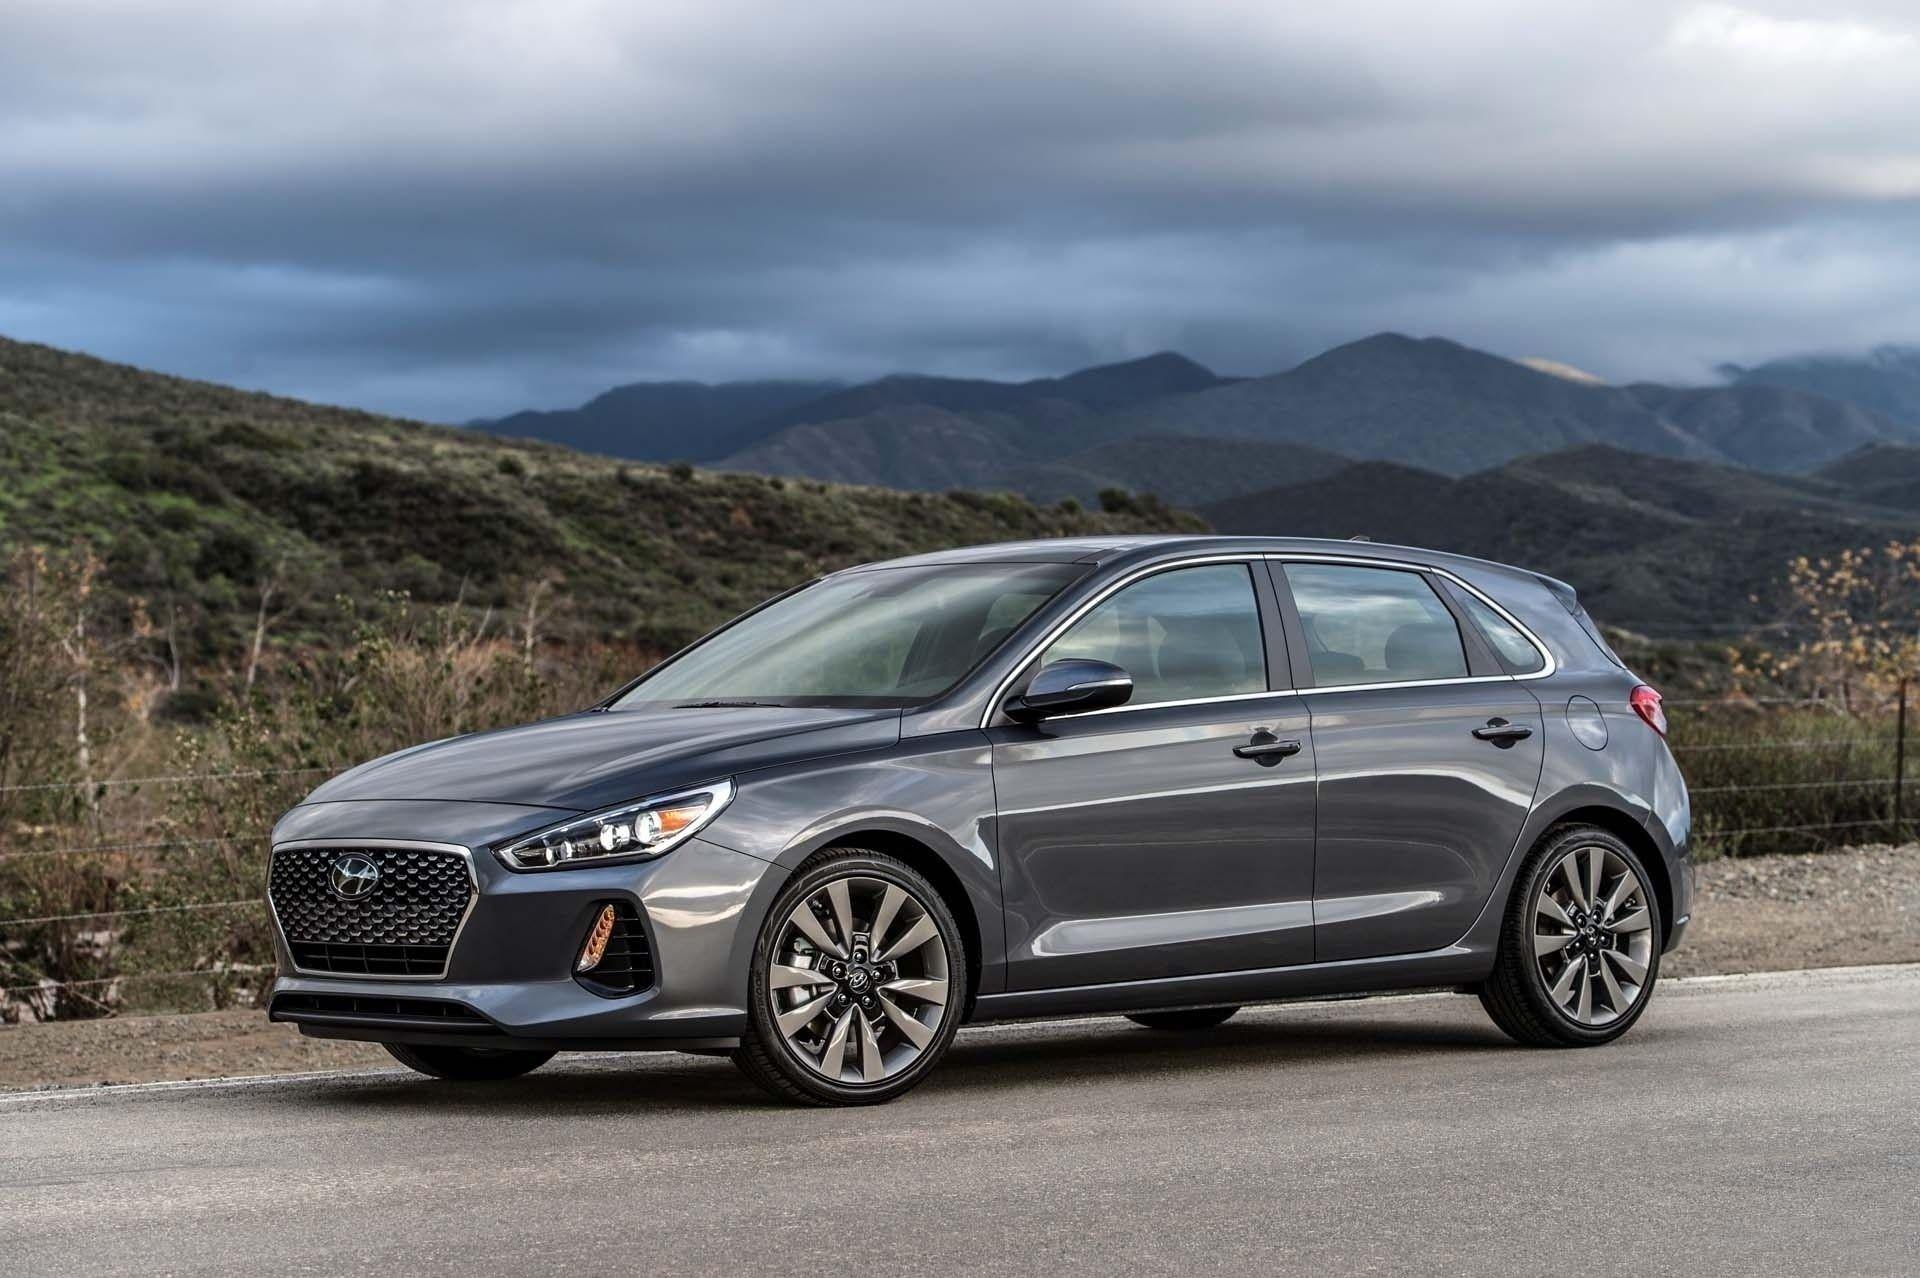 2019 Hyundai Accent Hatchback Release Car 2019 Elantra Hyundai Elantra Hyundai Cars